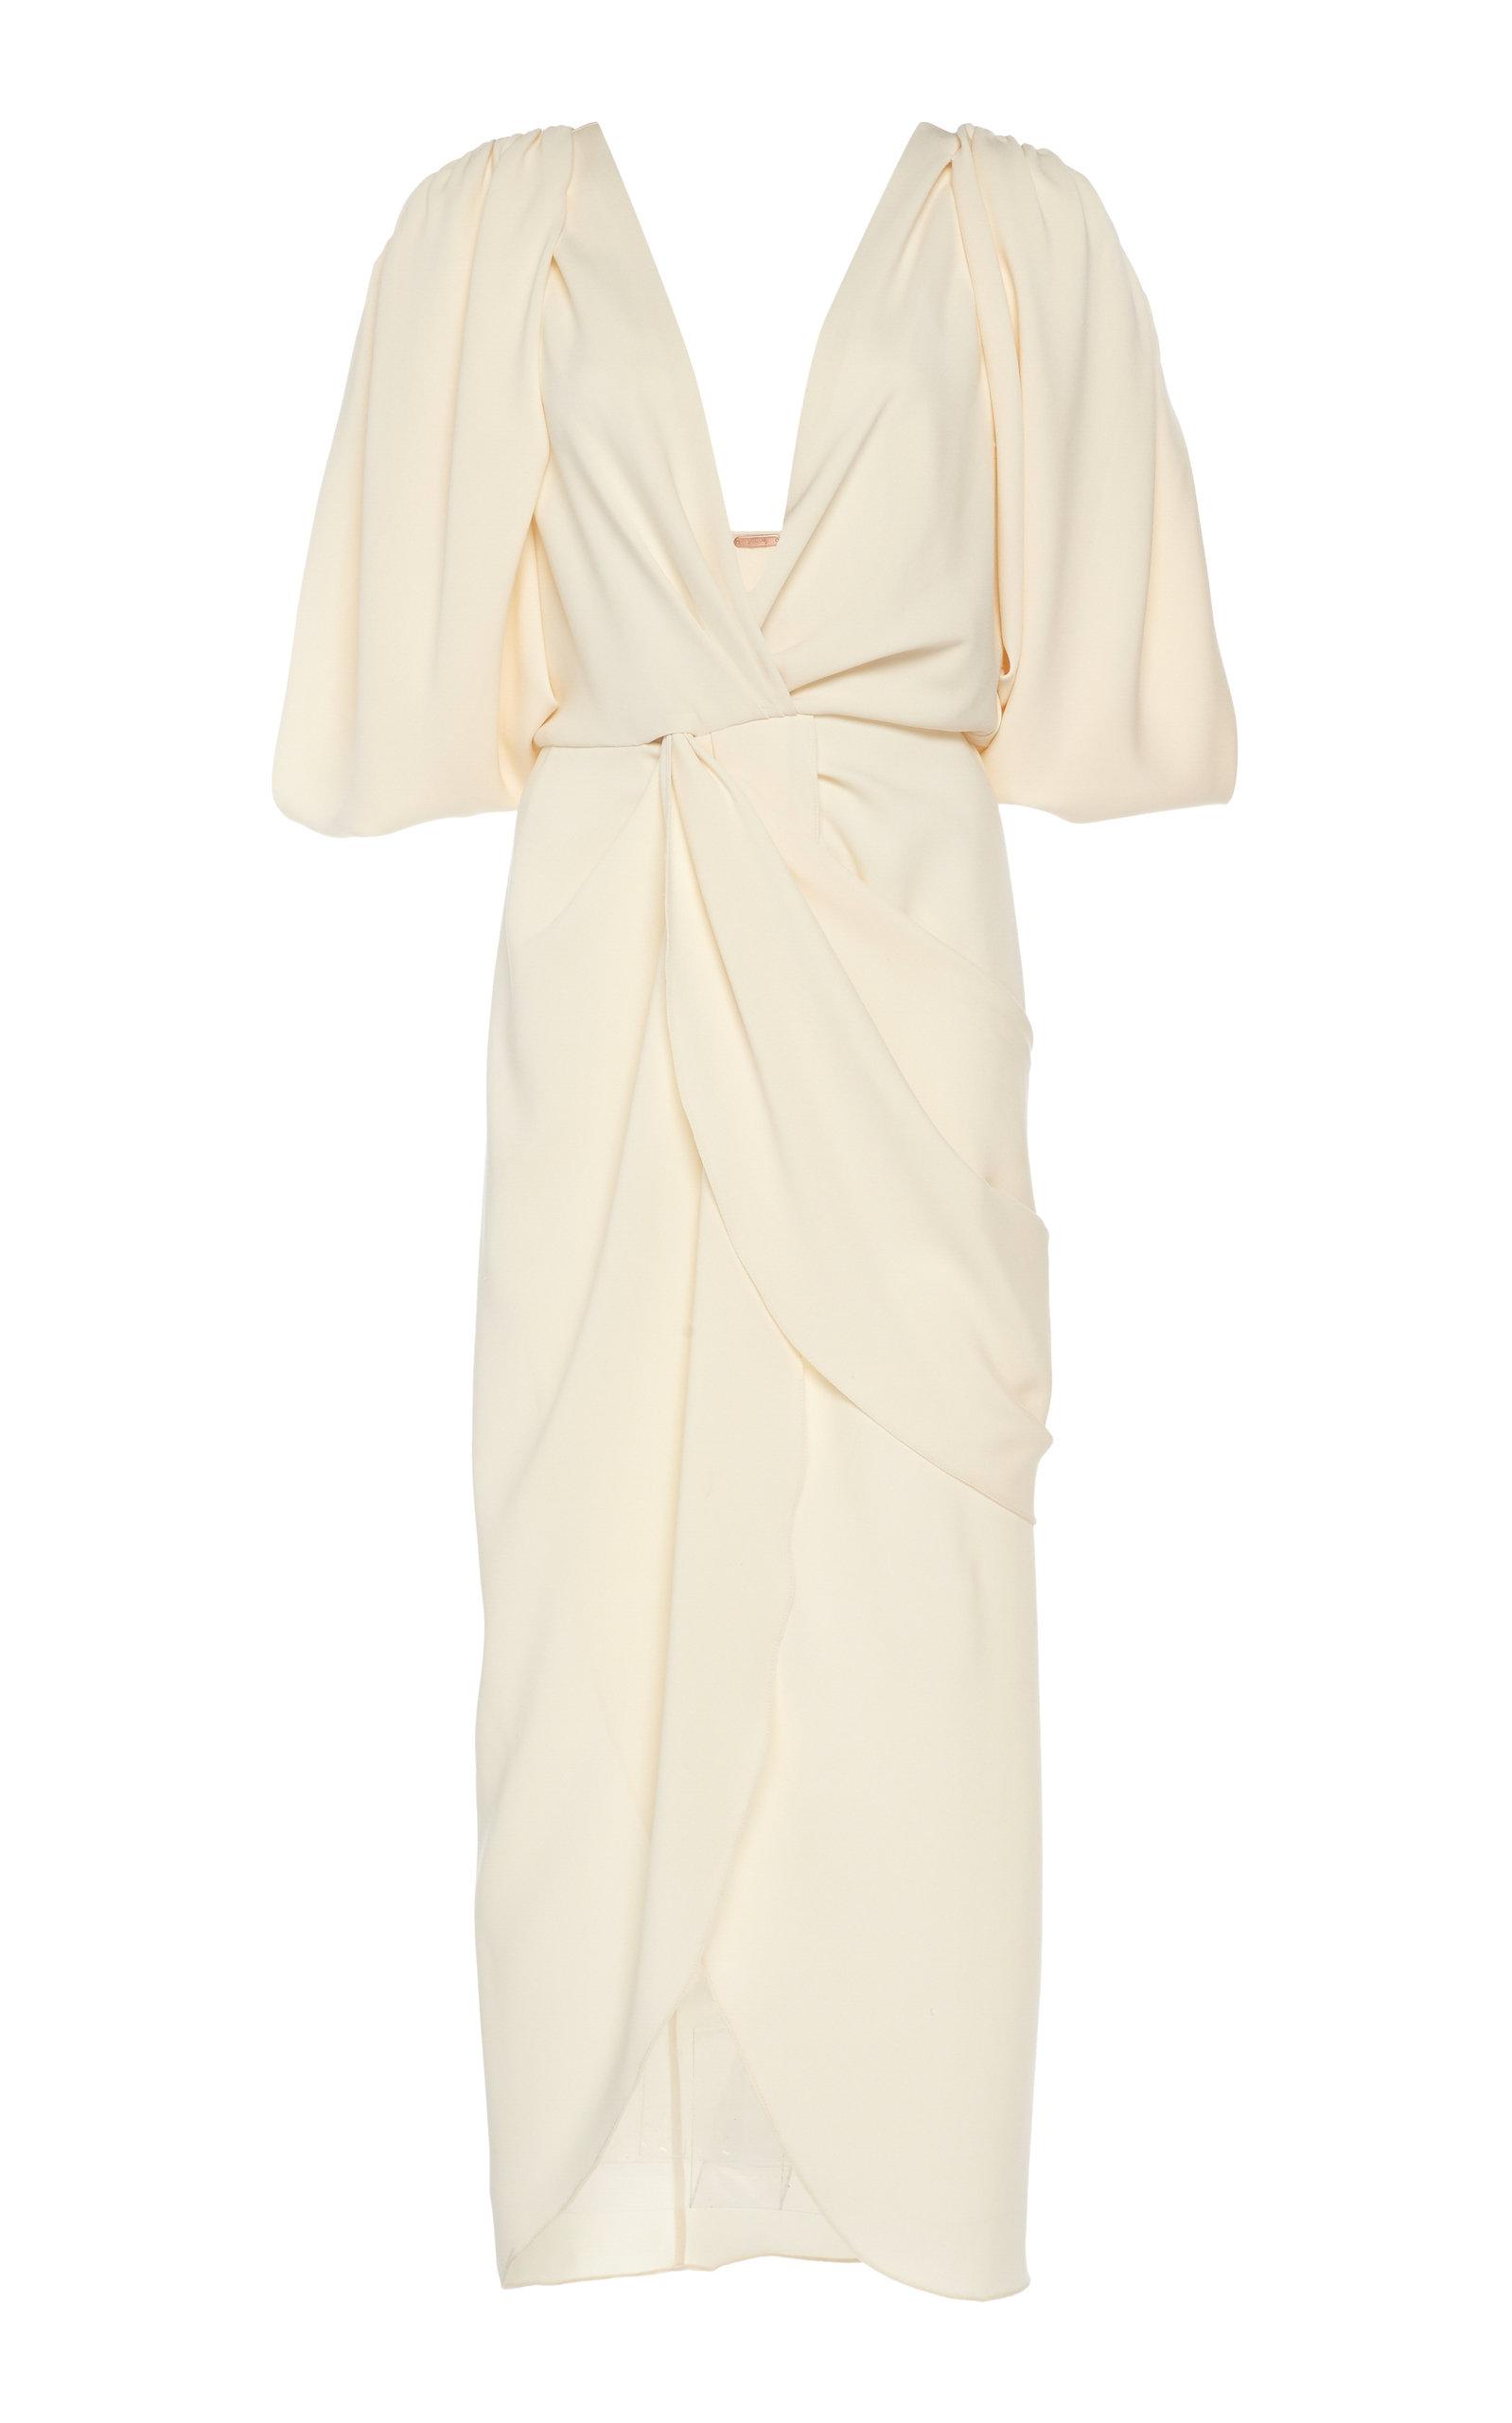 Buy Johanna Ortiz Classic Meets Cuba Draped Crepe Midi Dress online, shop Johanna Ortiz at the best price